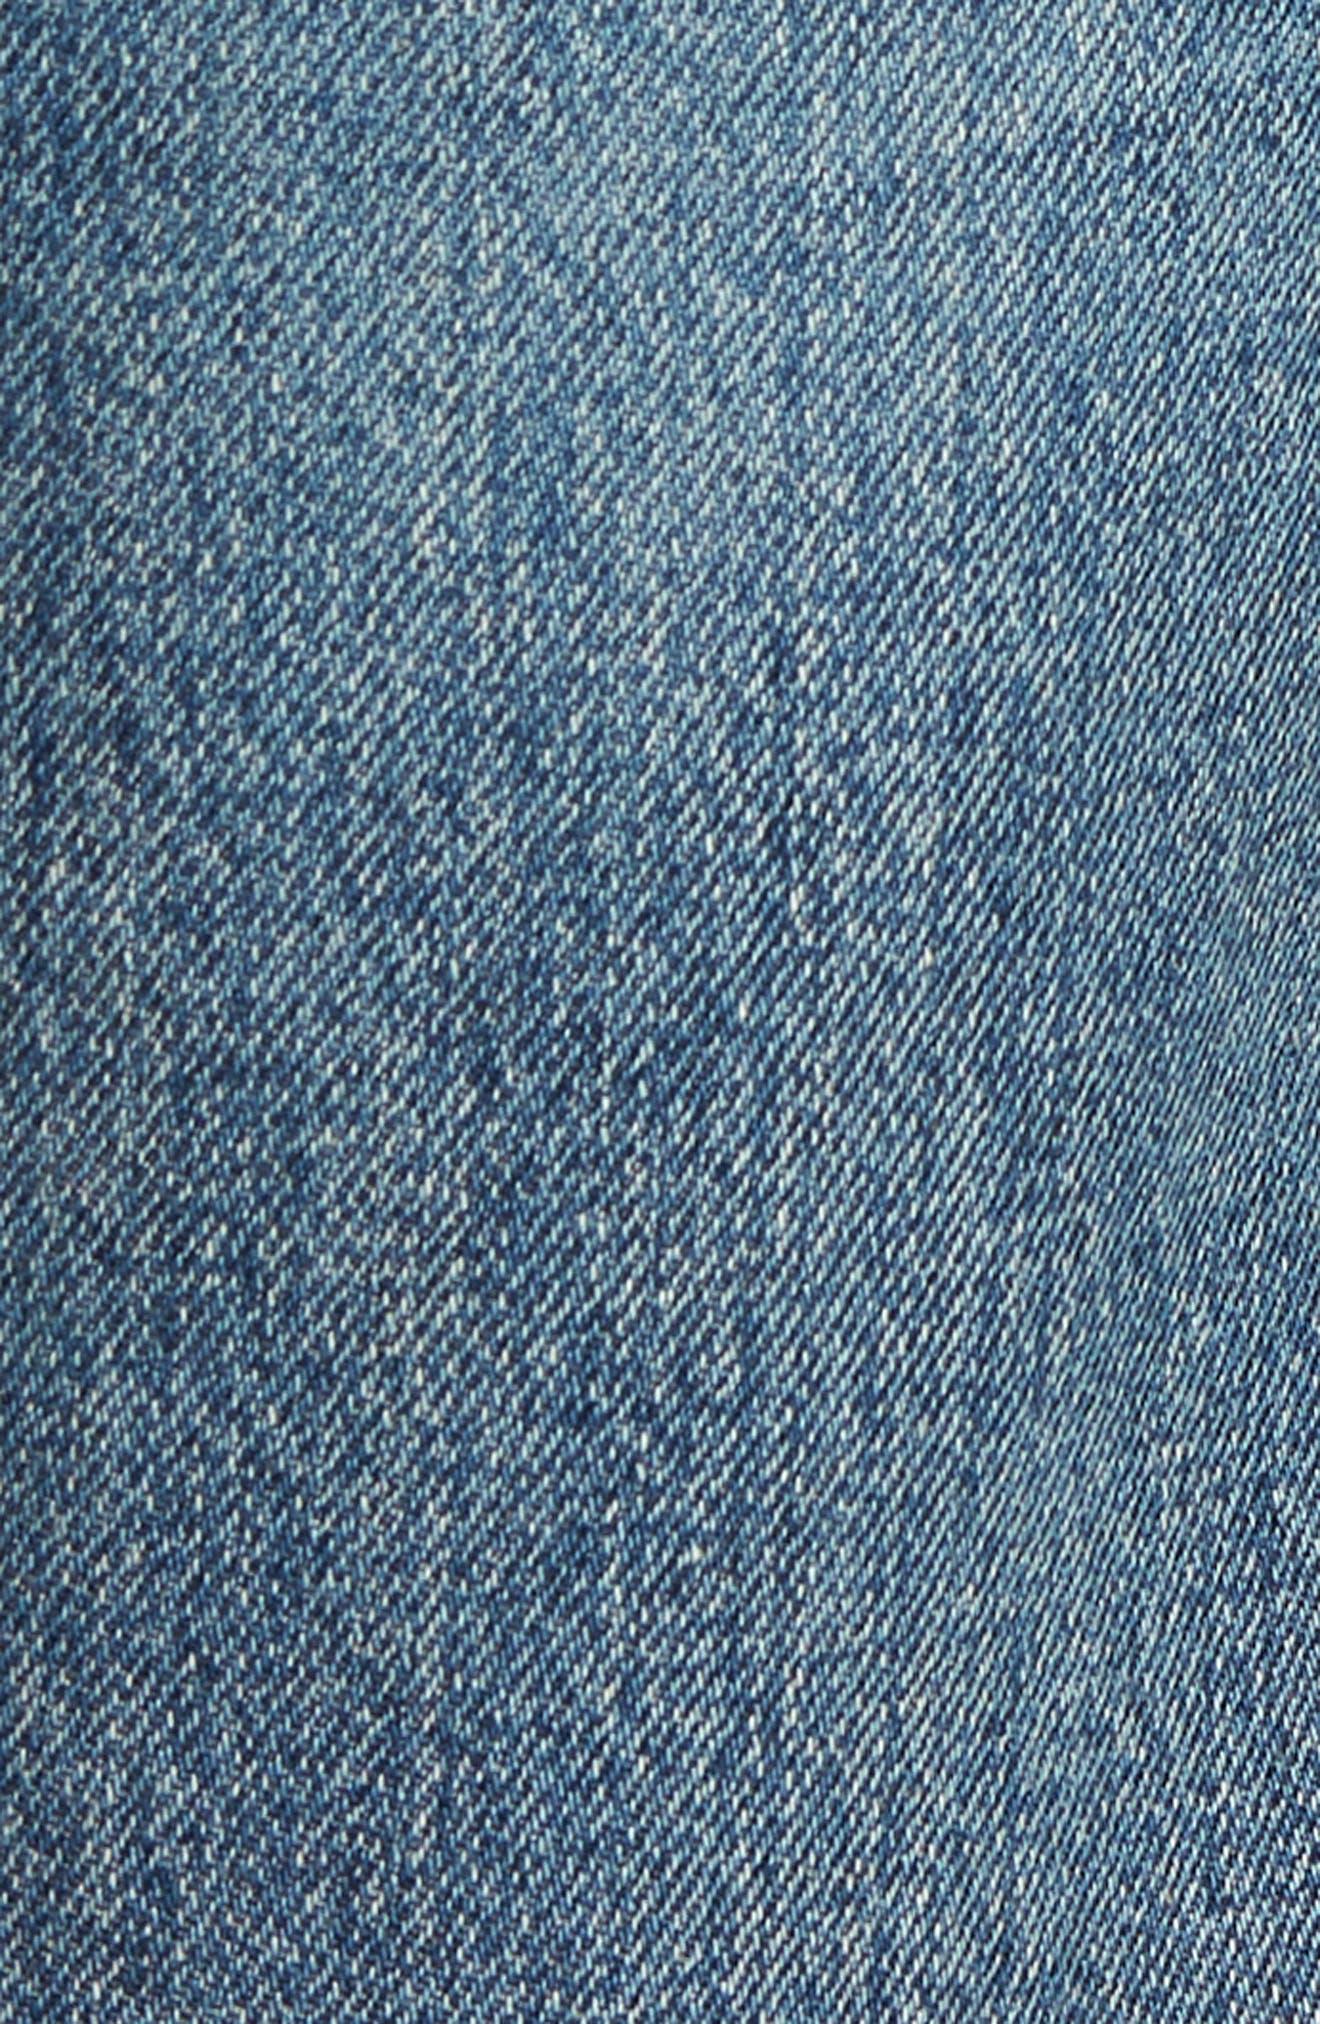 Emma High Waist Crop Wide Leg Jeans,                             Alternate thumbnail 6, color,                             428